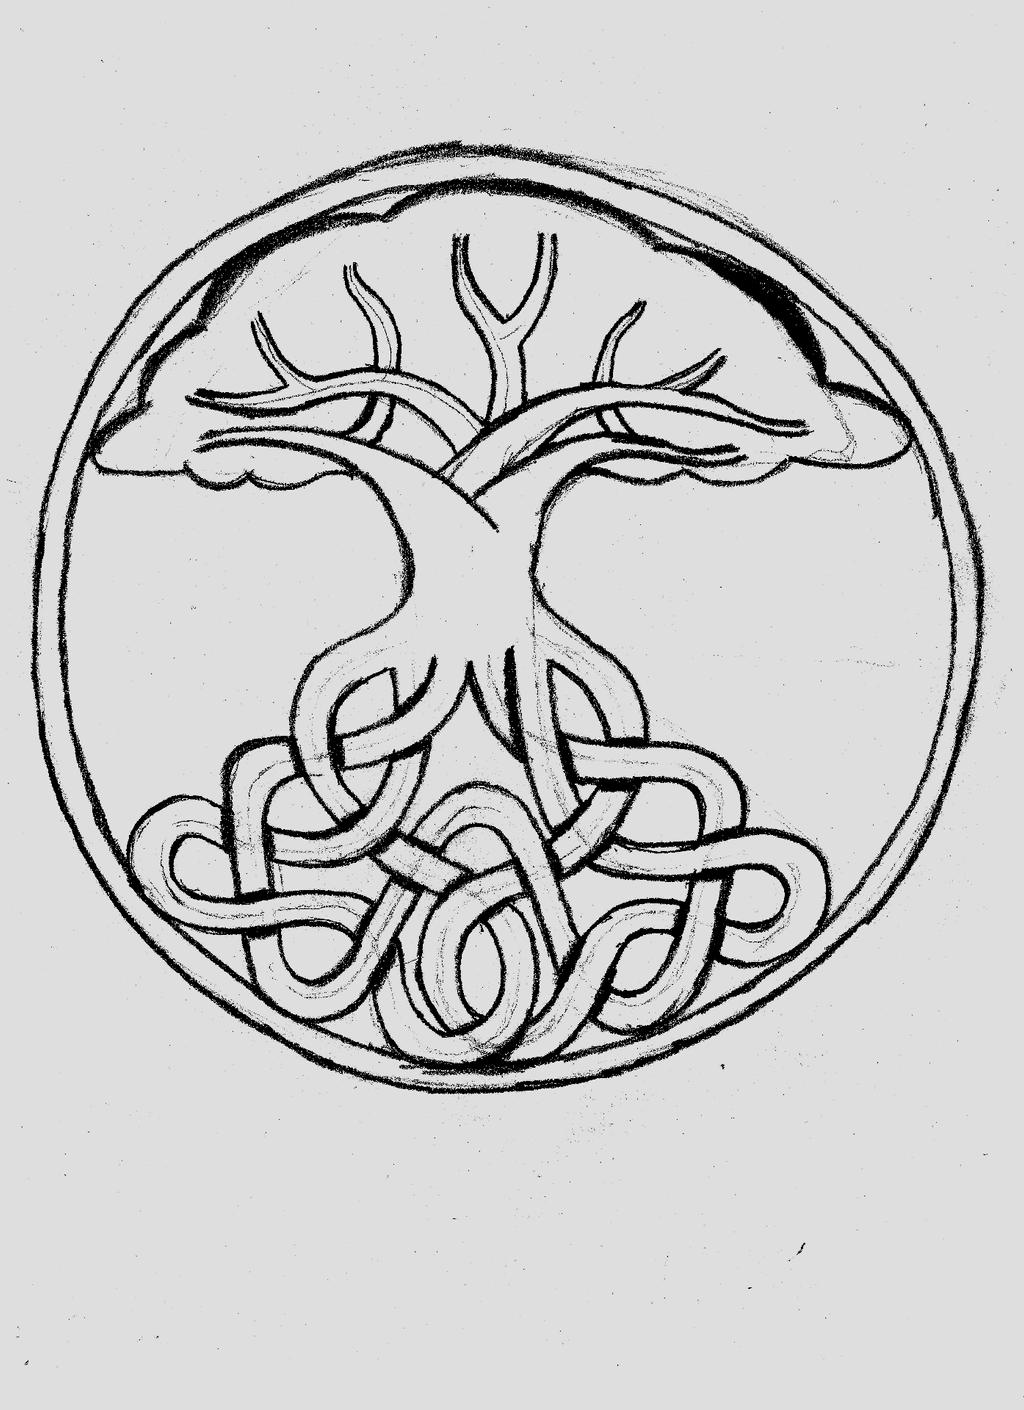 Tree Of Life Sketch By Immortal Lynx On Deviantart